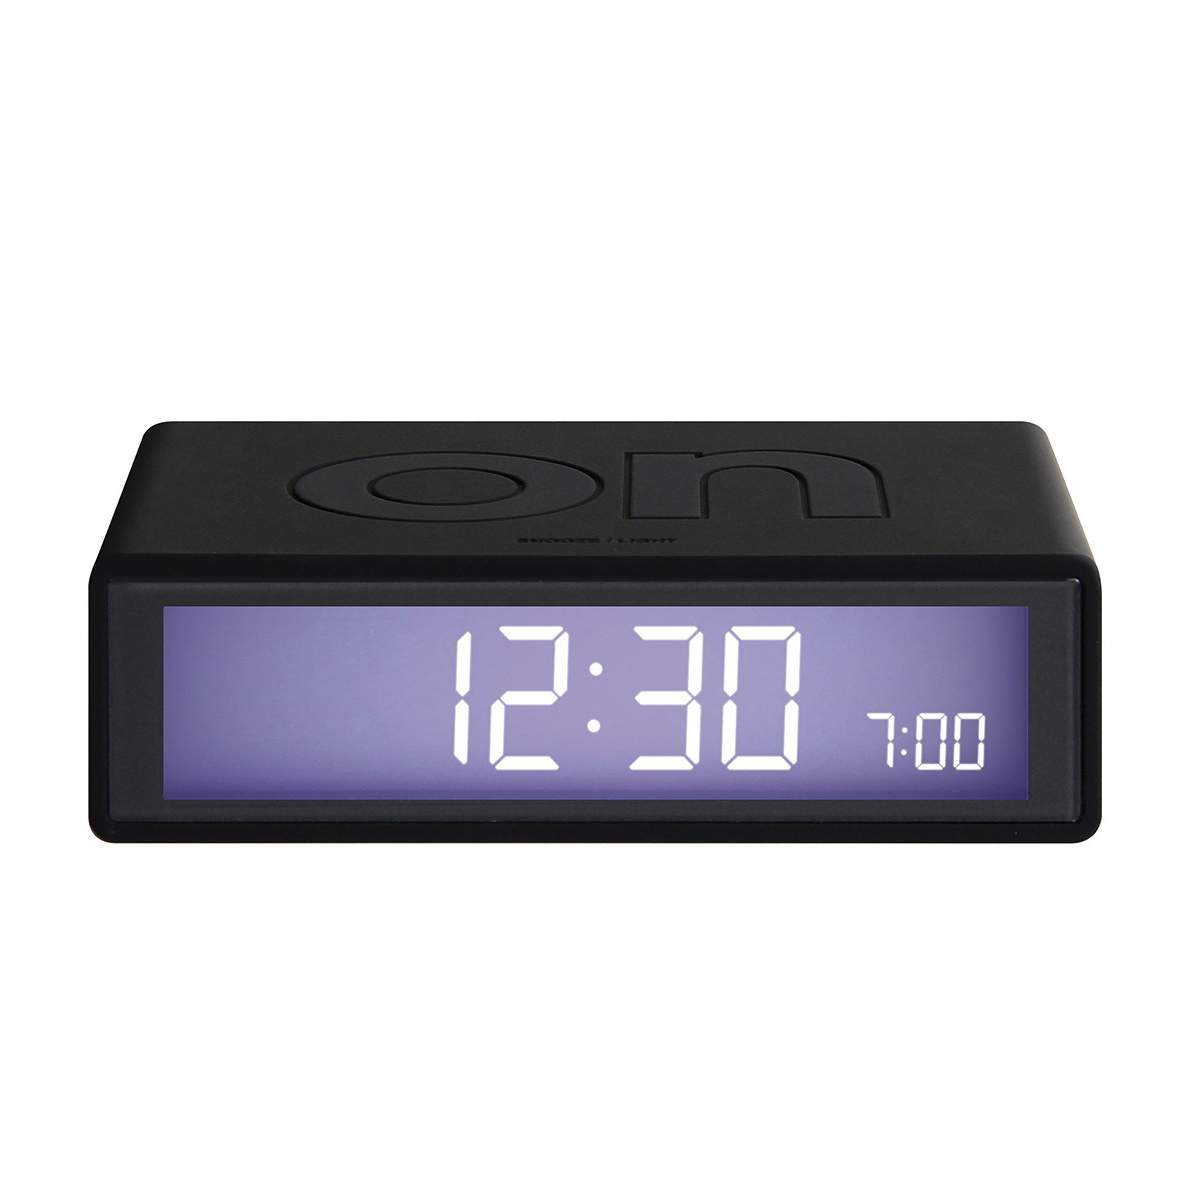 LEXON Flip LCD alarm clock LR150 black | The Design Gift Shop